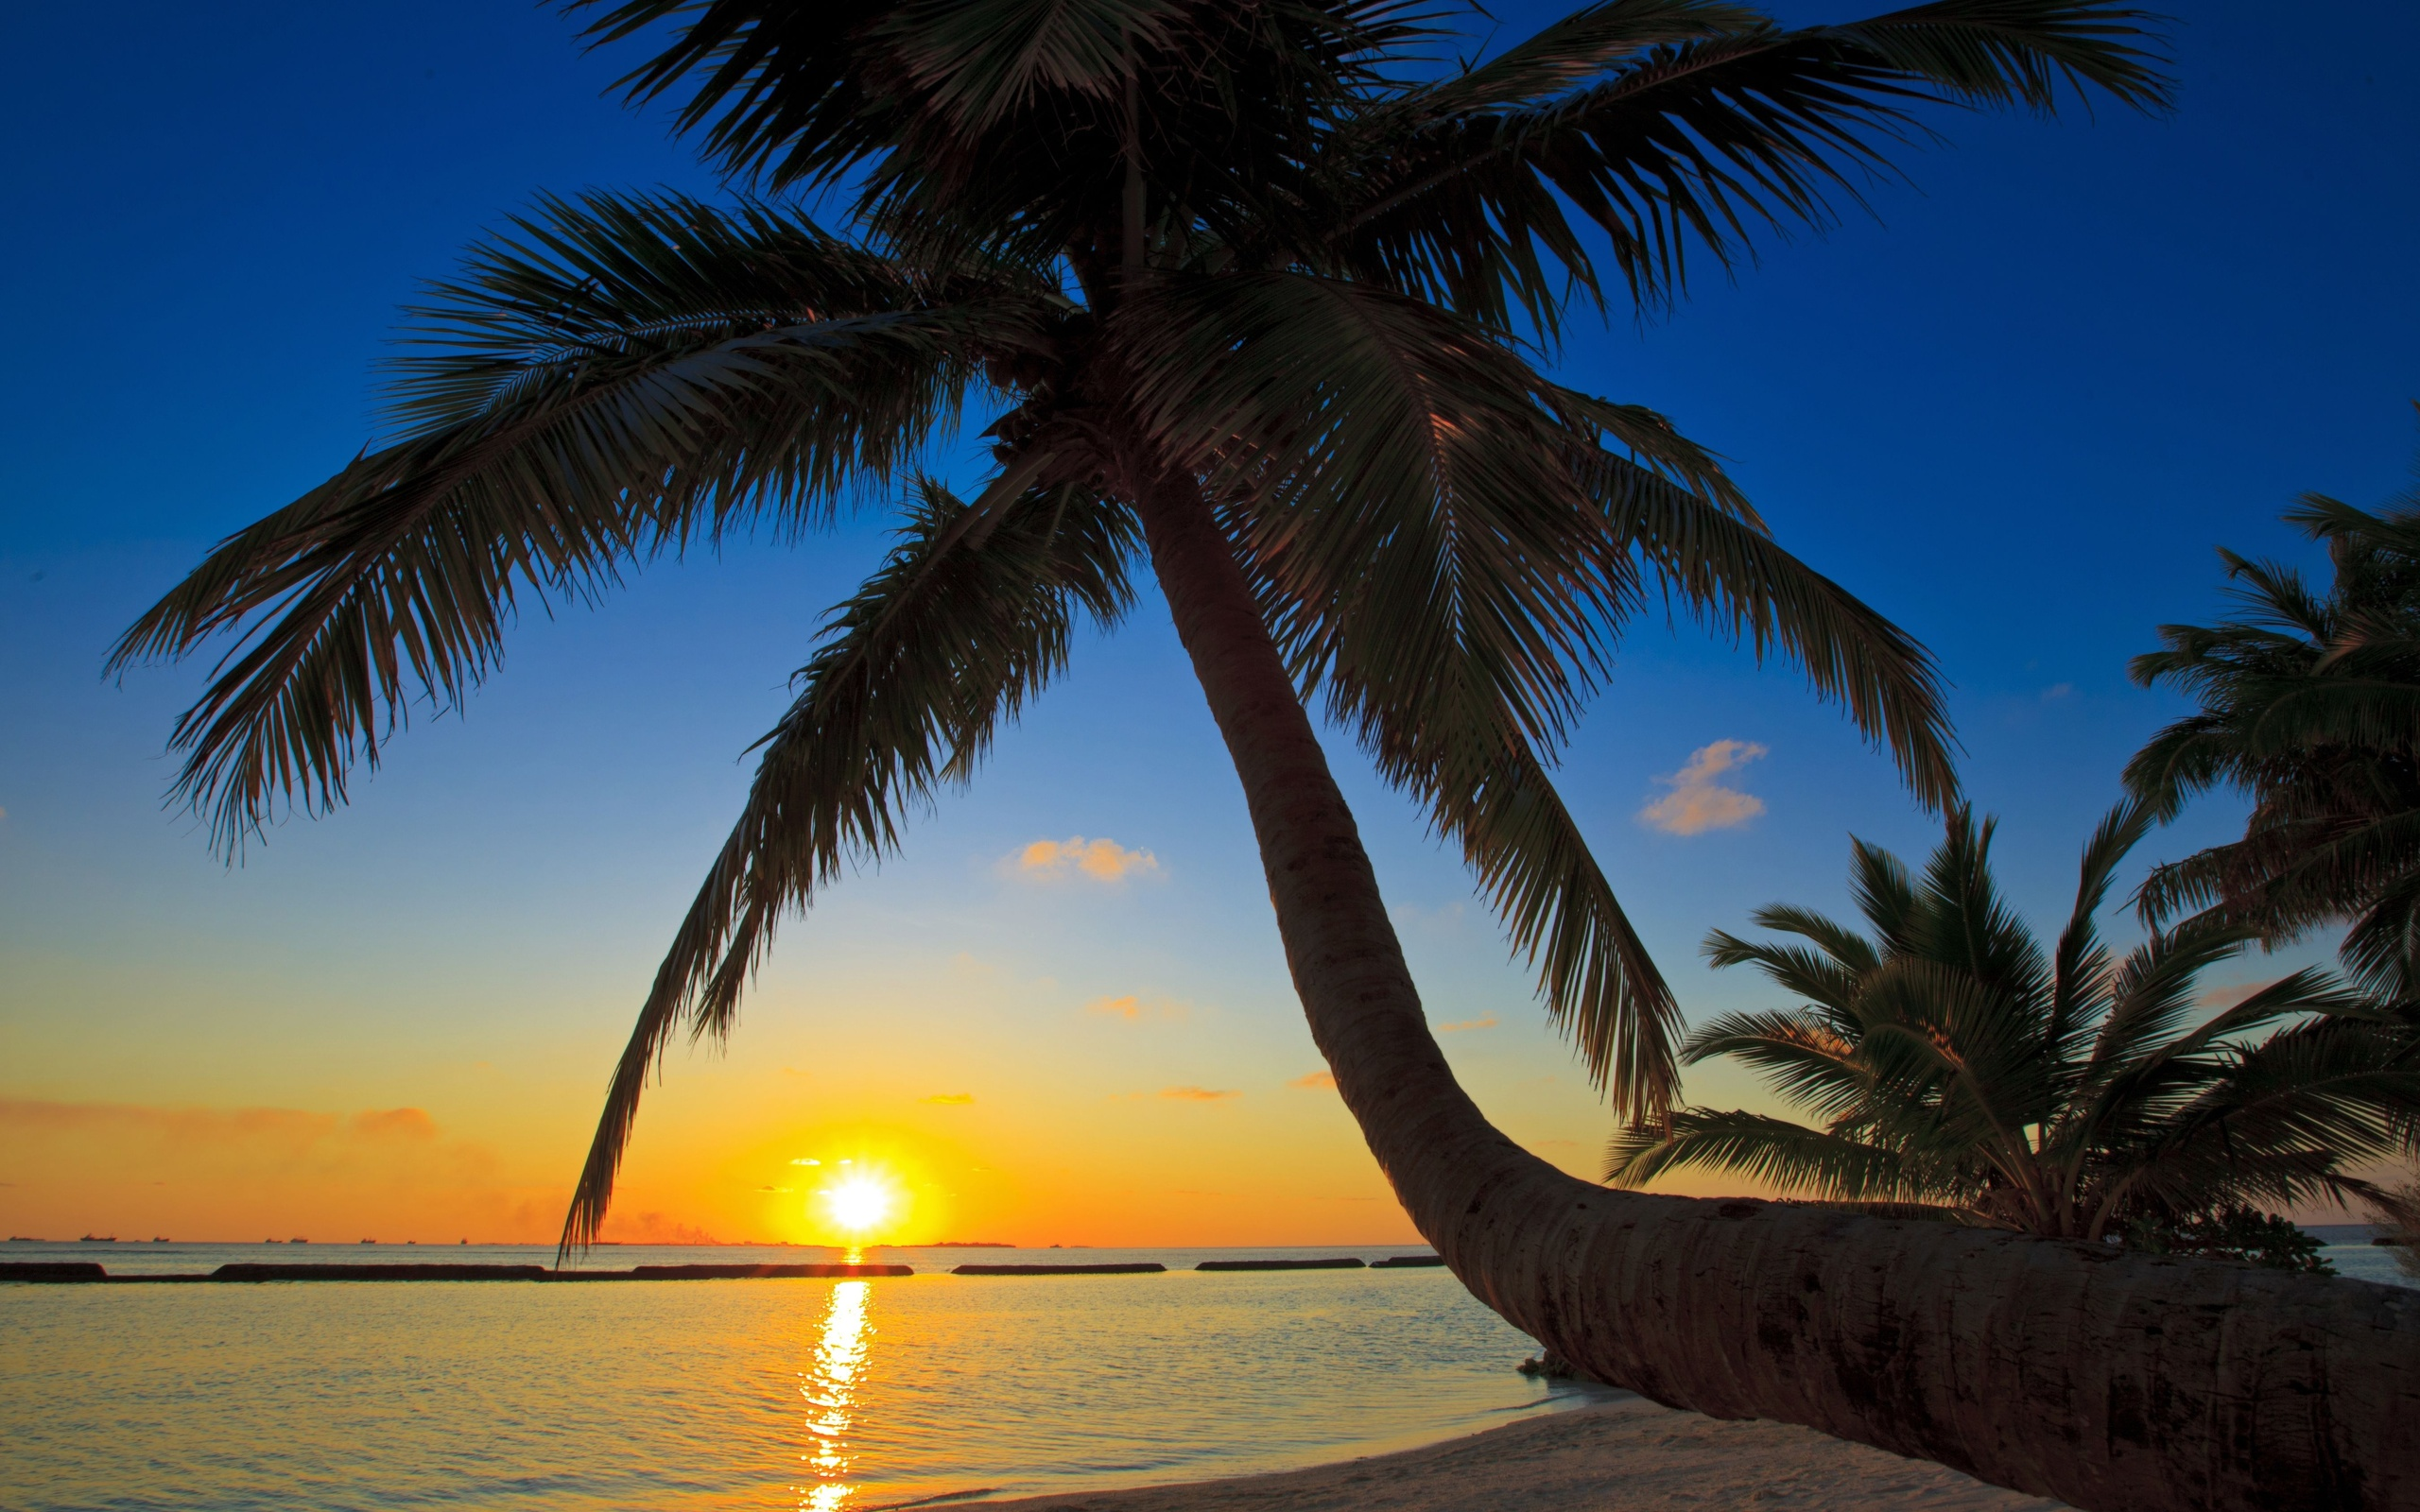 Sunset sea palm trees beaches wallpaper 2560x1600 74863 2560x1600